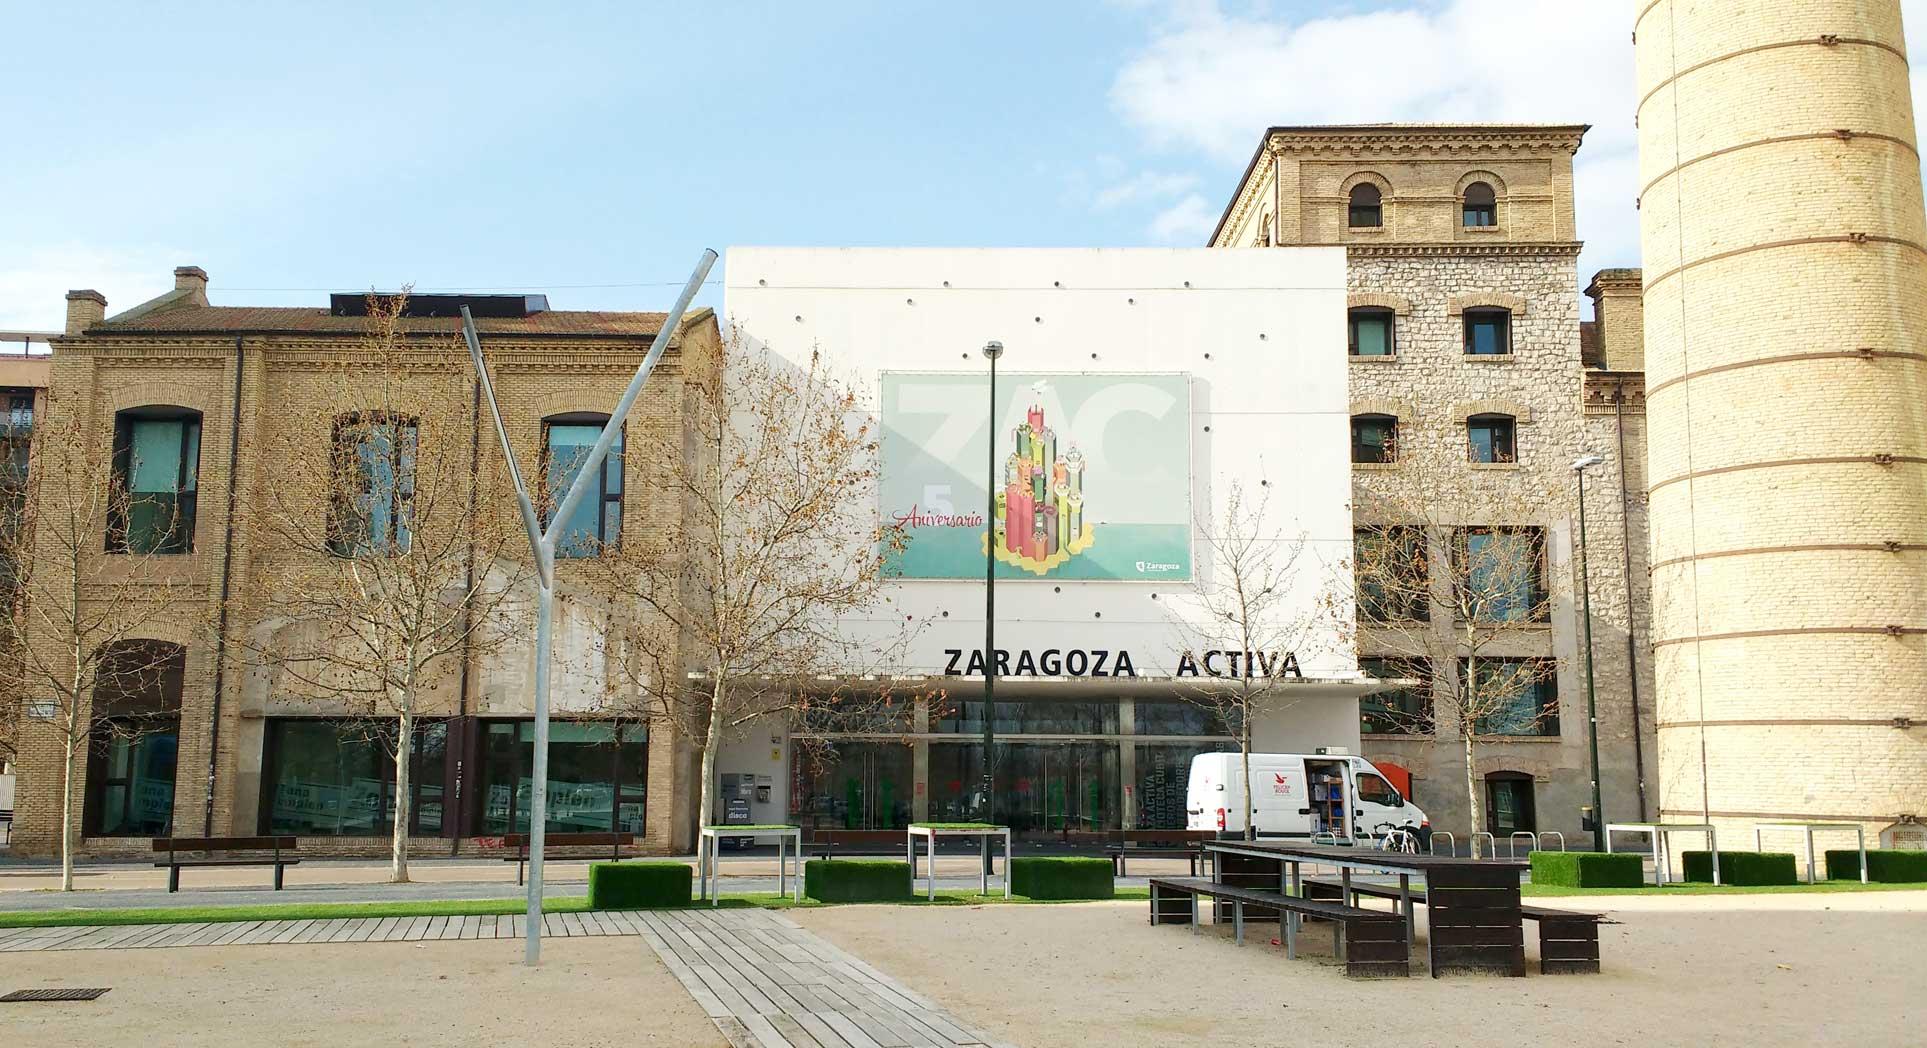 Zaragoza Activa building.